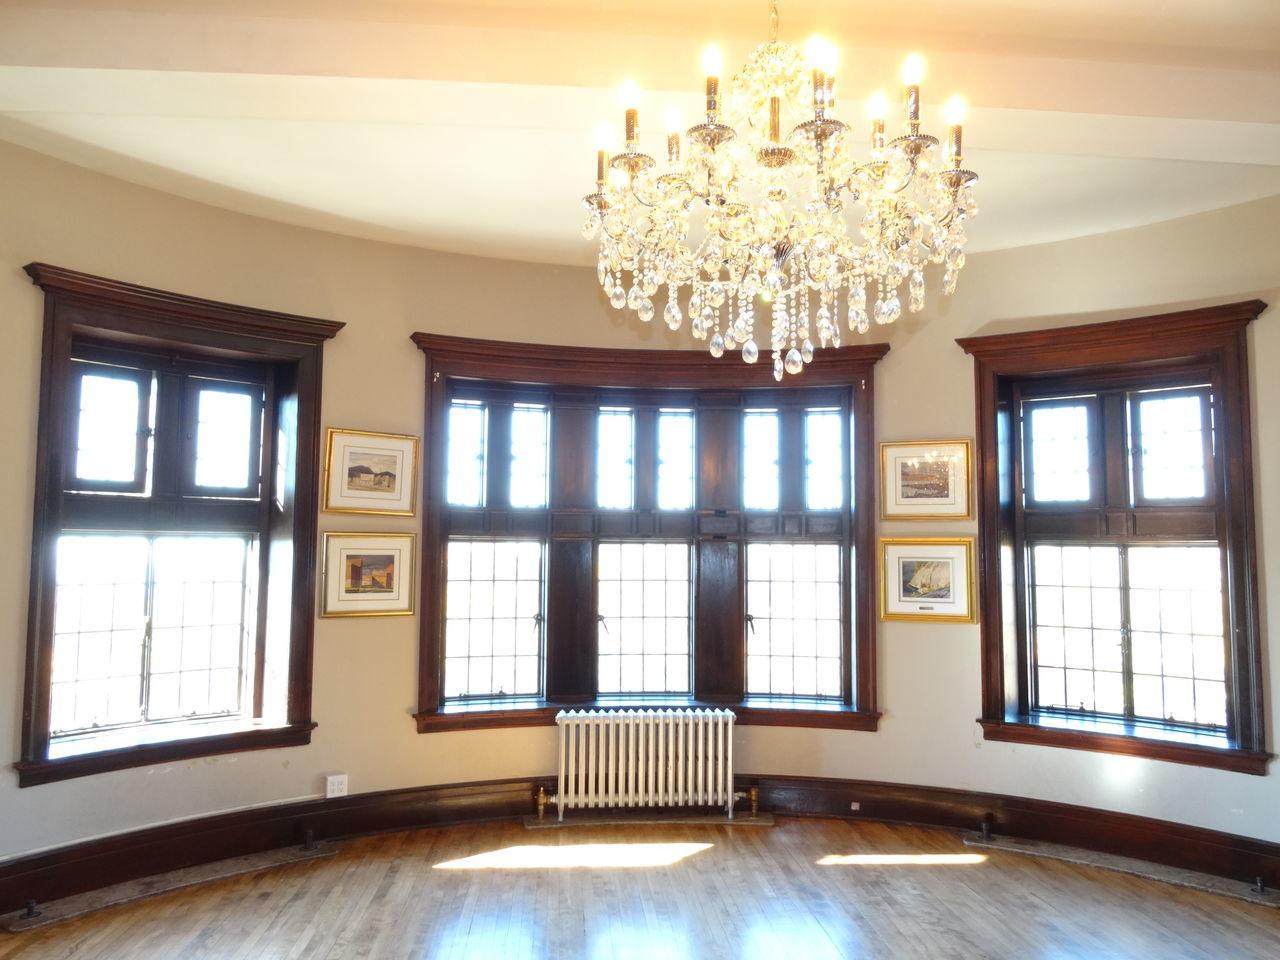 window, indoors, lighting equipment, illuminated, no people, architecture, day